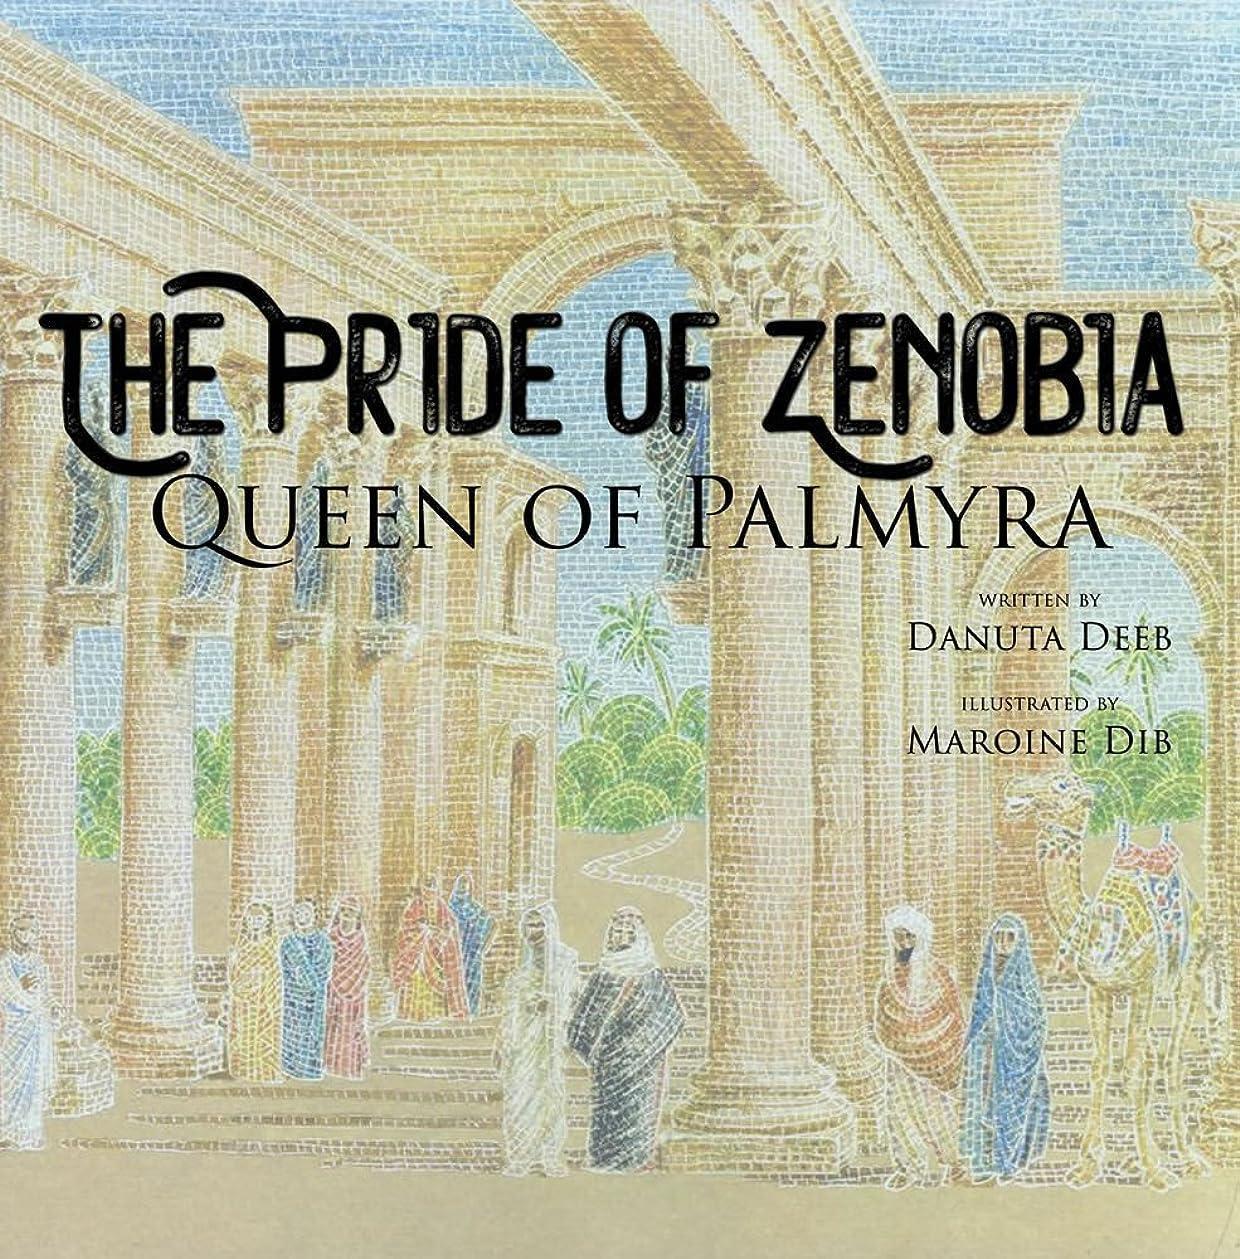 The Pride of Zenobia: Queen of Palmyra (English Edition)